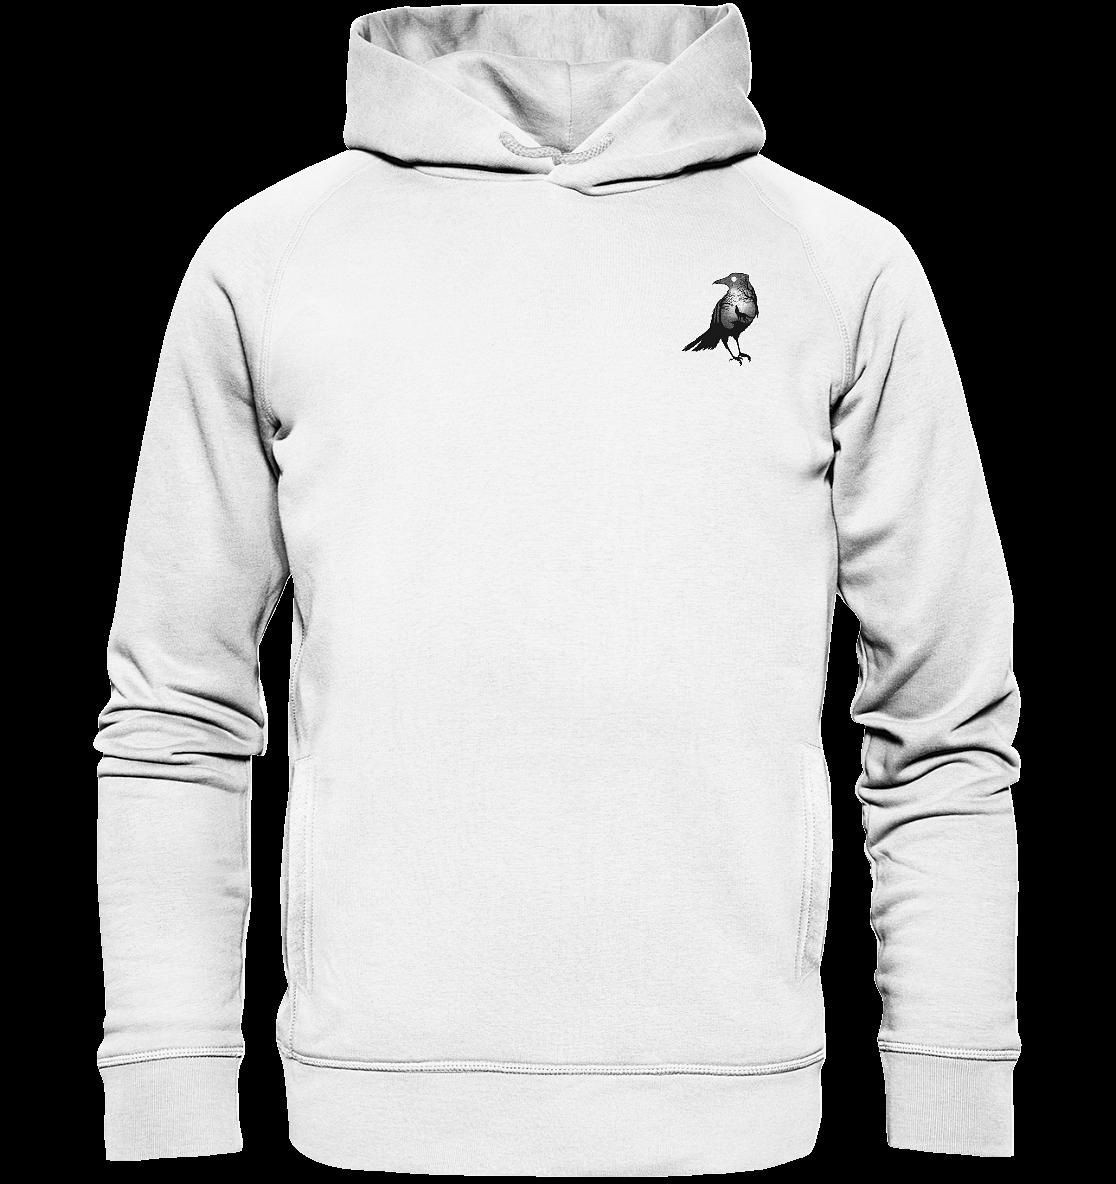 front-organic-fashion-hoodie-f8f8f8-1116x-2.png